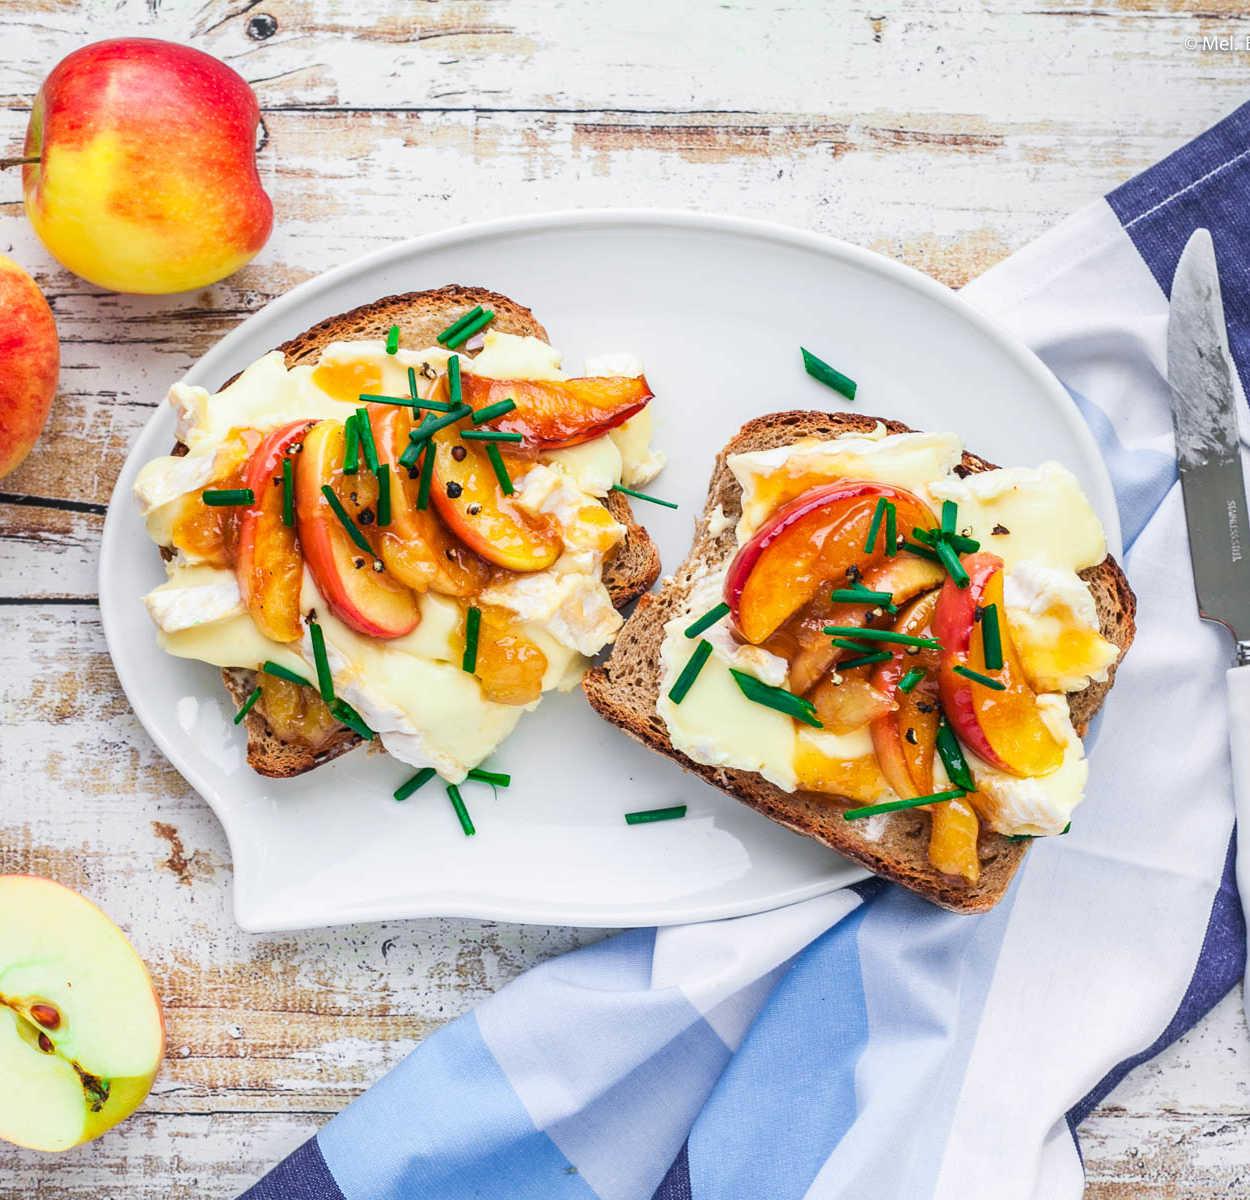 Feiste Stulle mit Camenbert, karamellisiertem Apfel und Mango-Chuntey |GourmetGuerilla.de